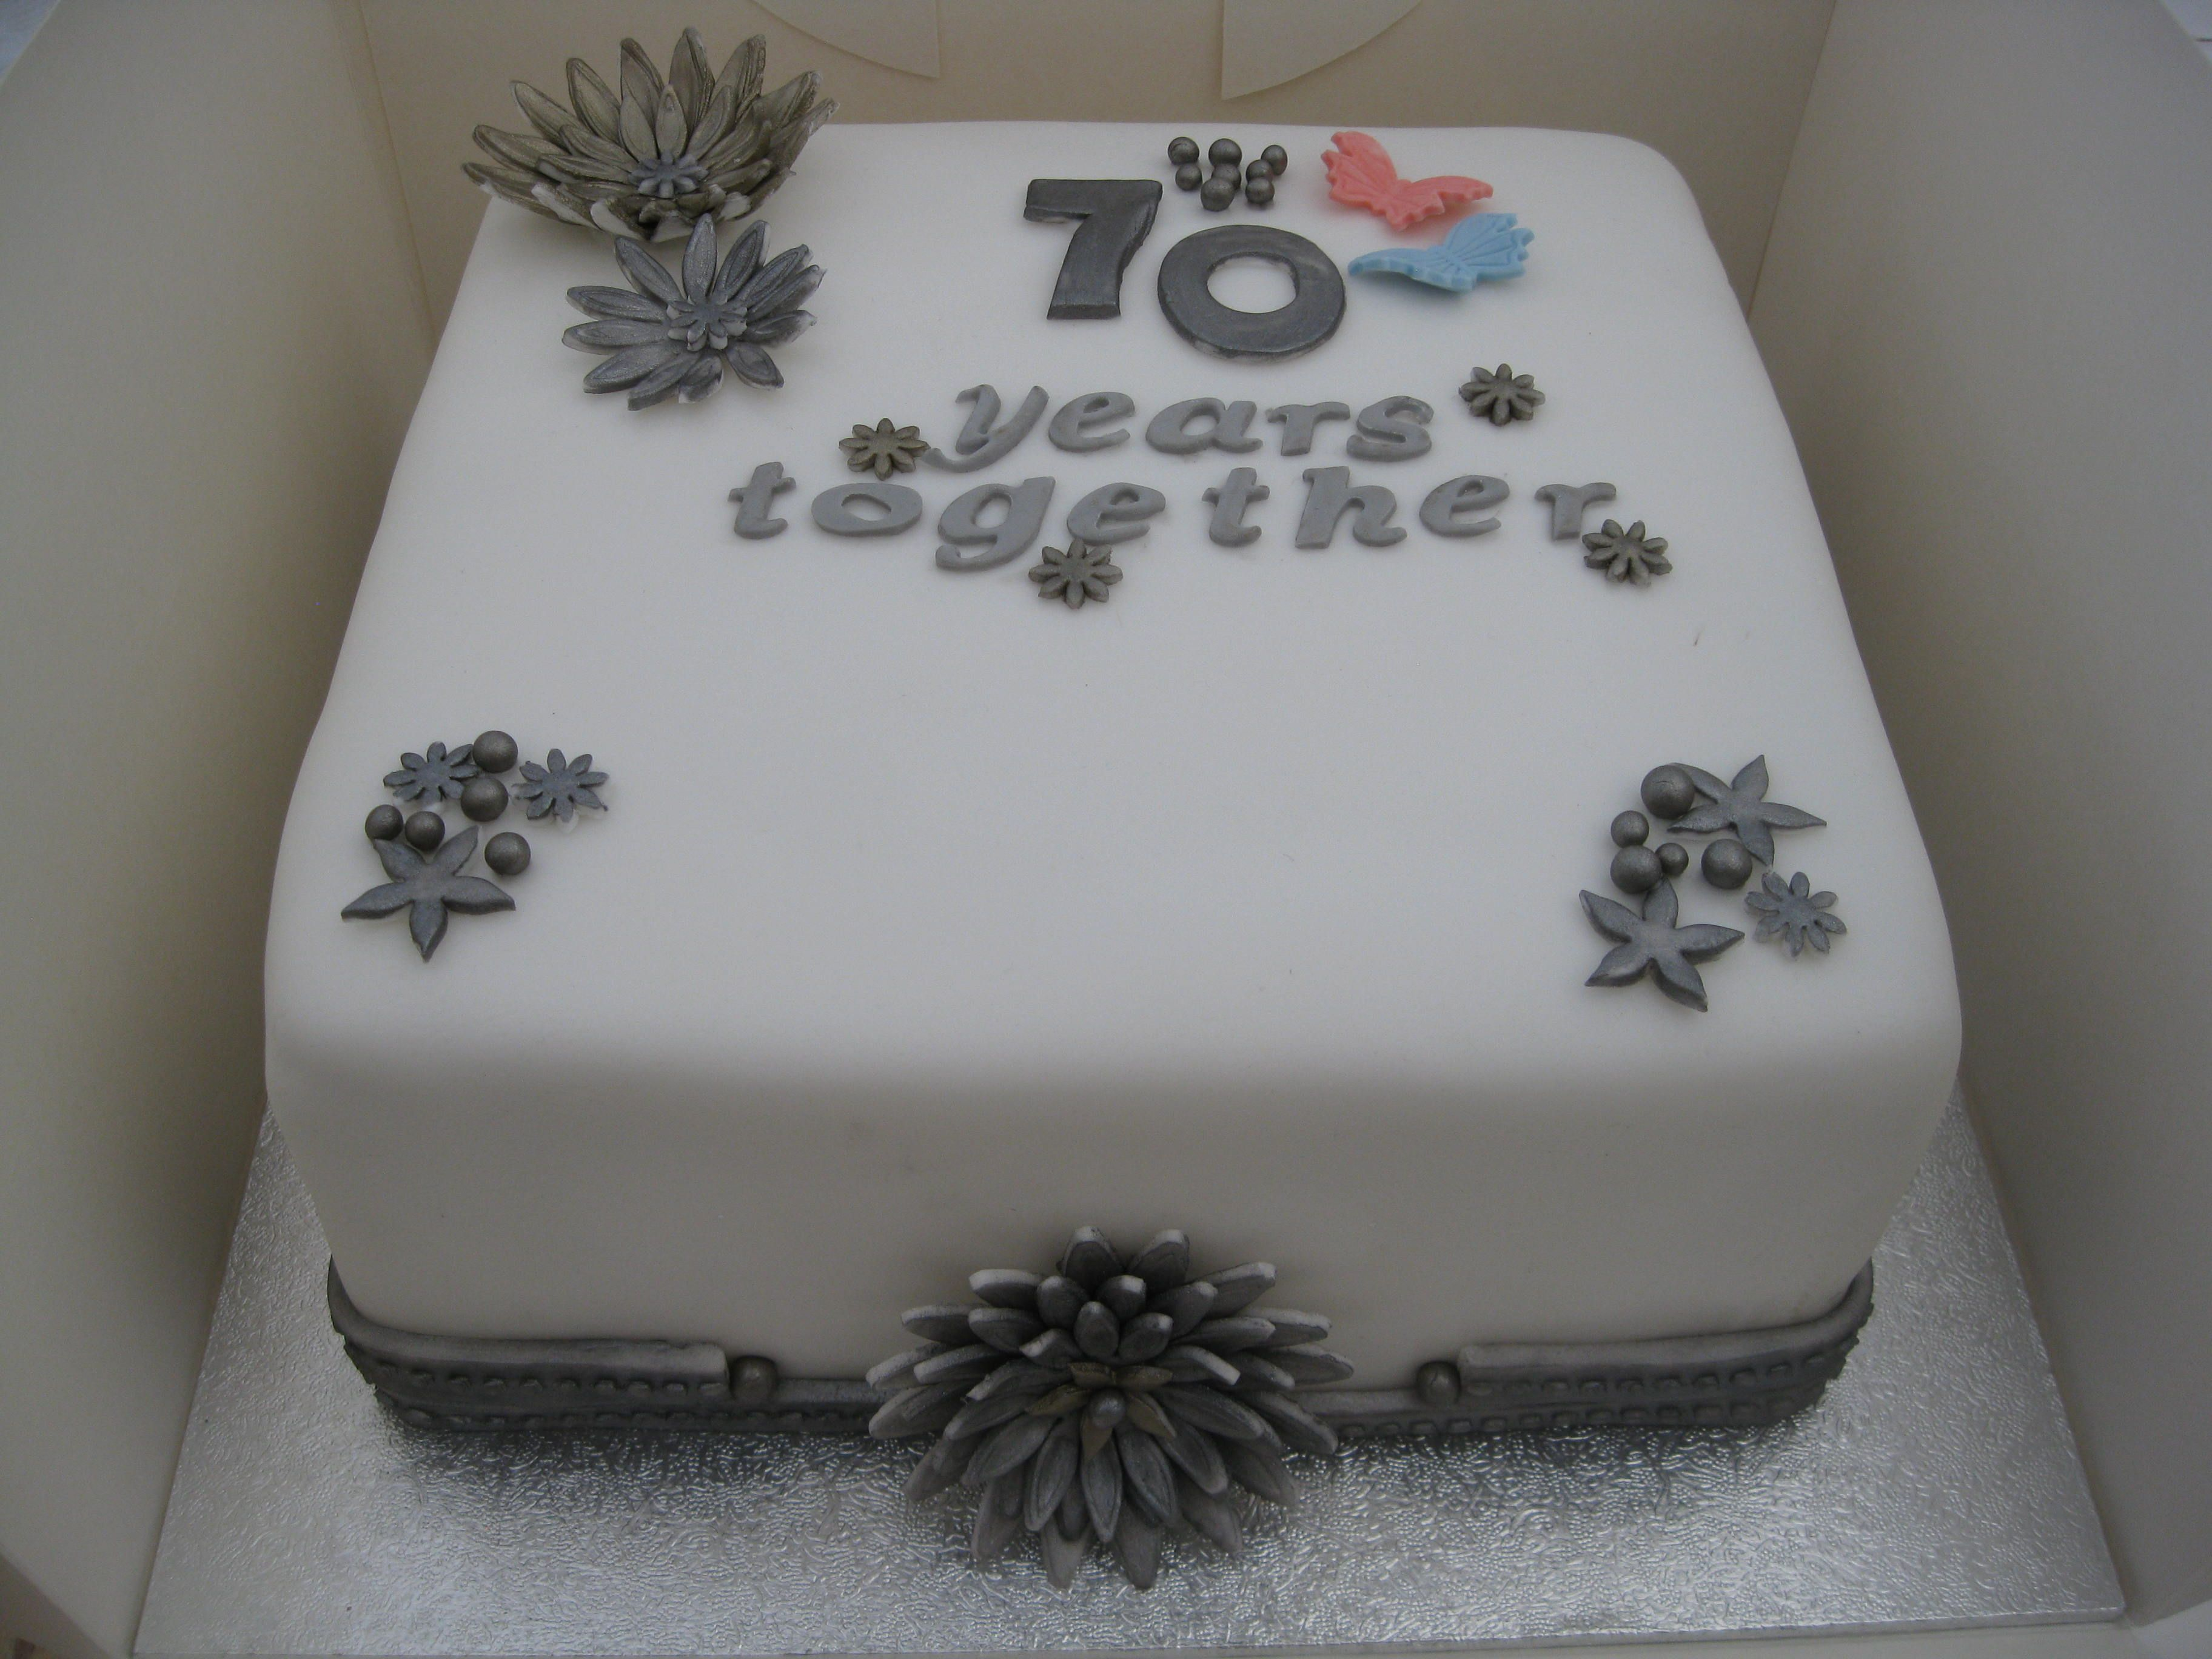 Platinum (70th) Wedding Anniversary Cake 70th wedding